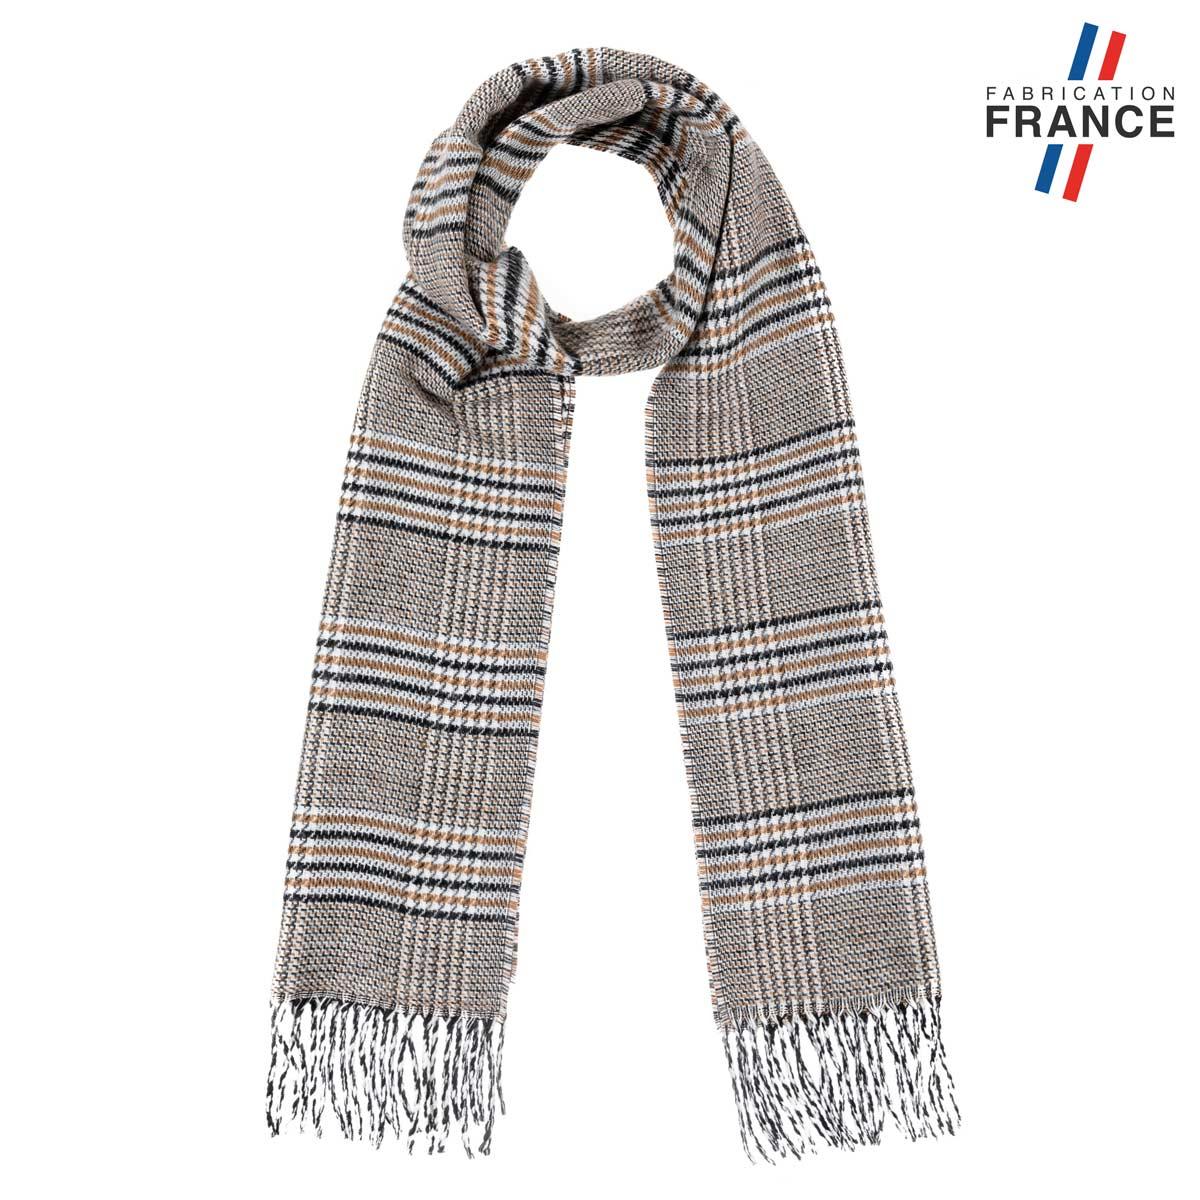 AT-06208-F12-LB_FR-echarpe-femme-carreaux-fabrication-france